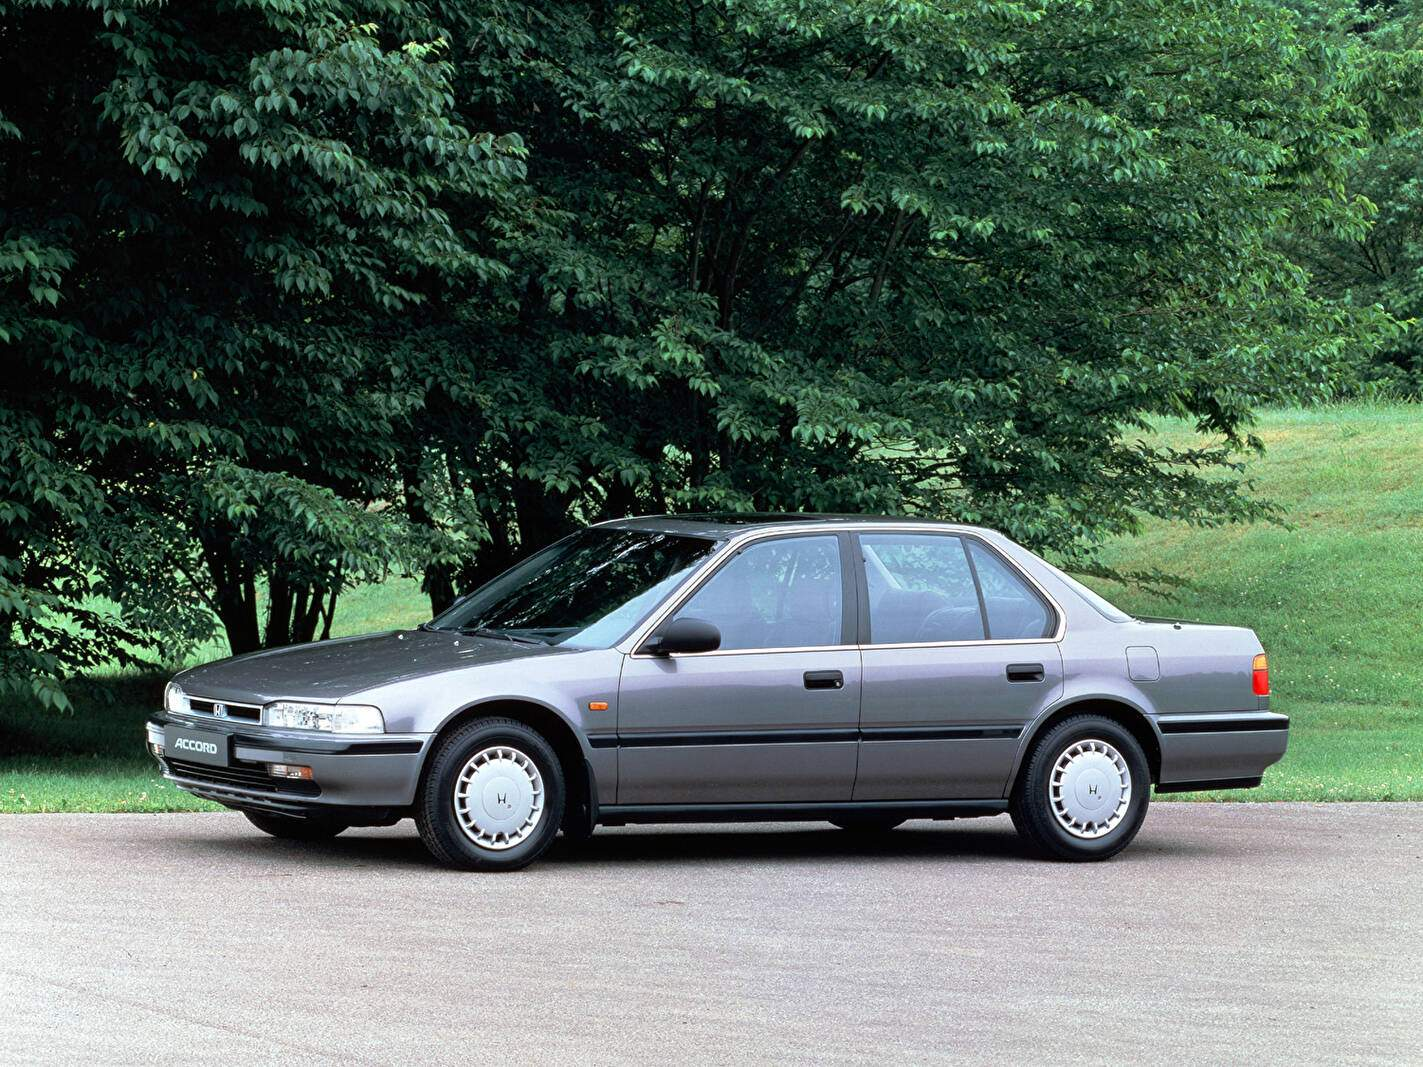 Honda Accord IV 2.0 150 (1989-1992),  ajouté par fox58